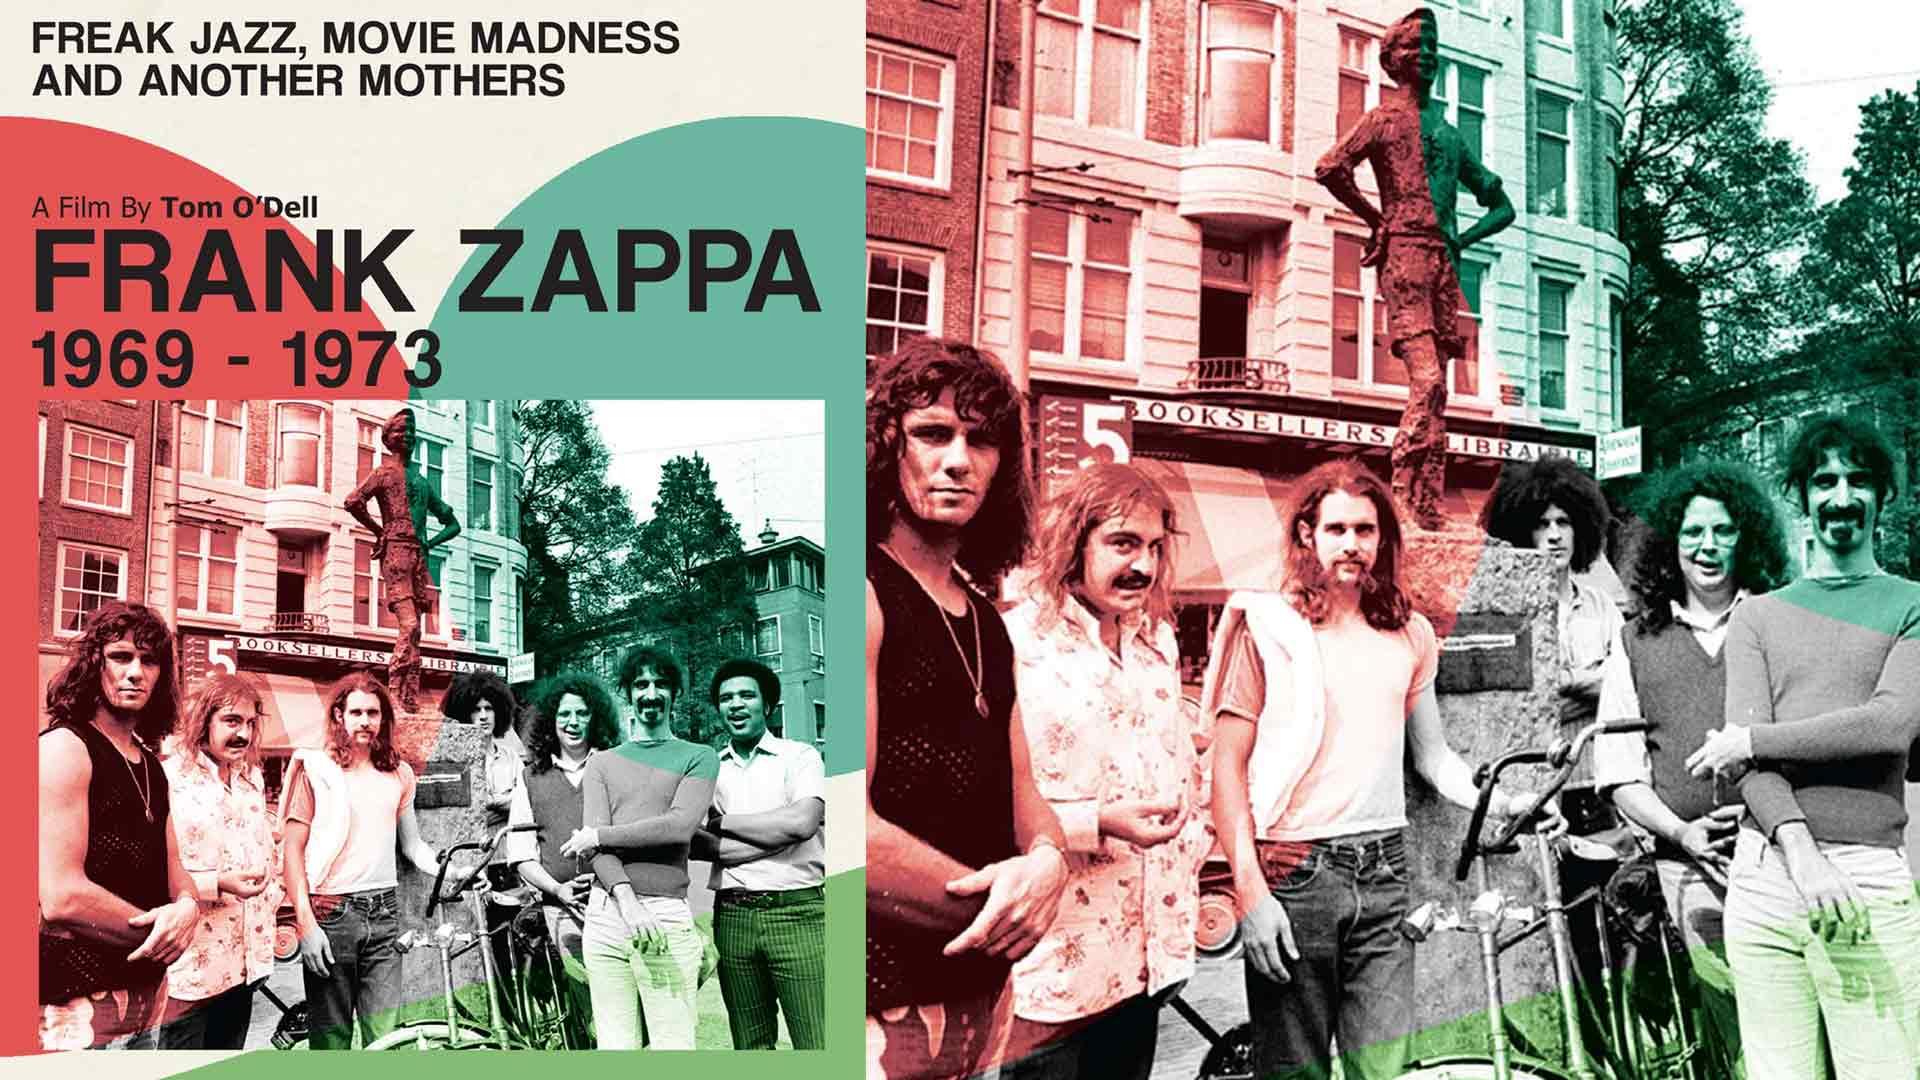 Frank Zappa: Freak Jazz, Movie Madness & Another Mothers